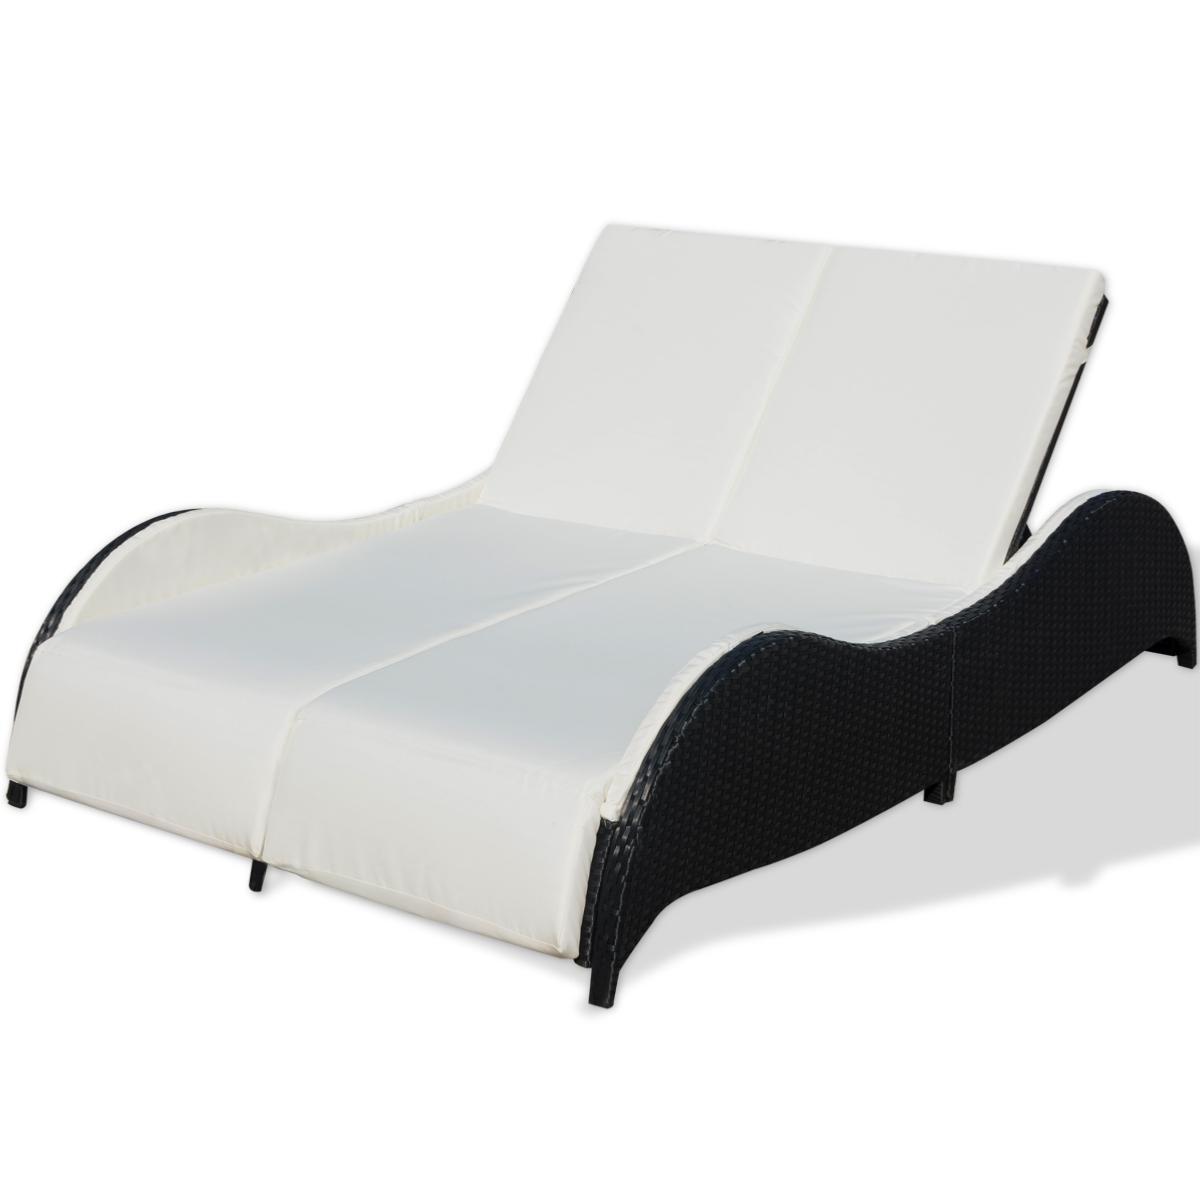 transat bain de soleil fashion designs. Black Bedroom Furniture Sets. Home Design Ideas